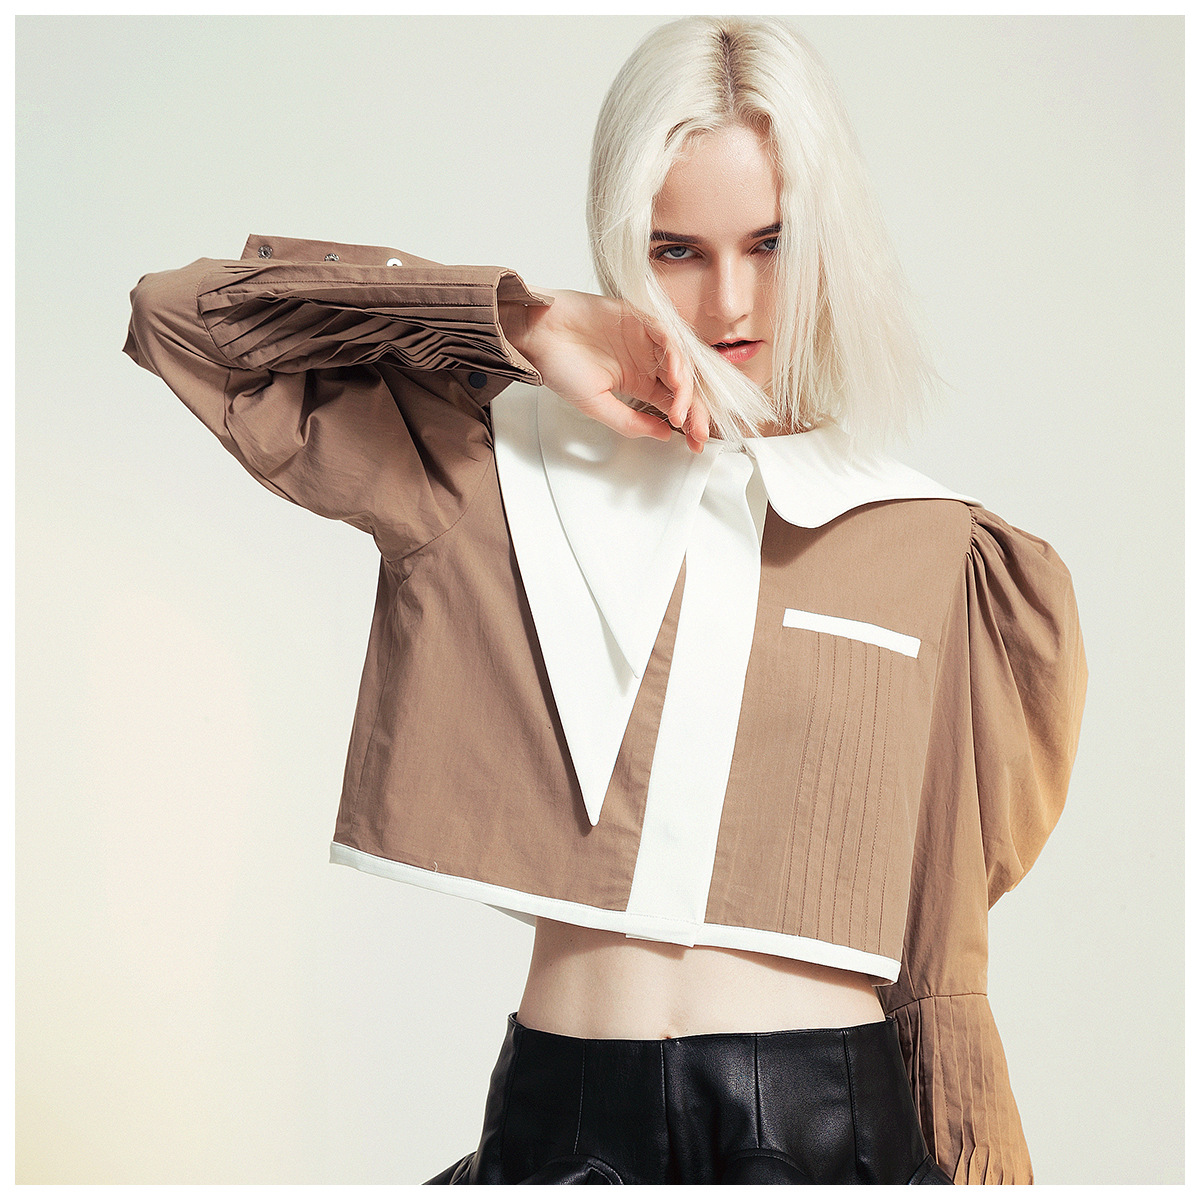 French Niche Design Asymmetrical Contrast Collar Lamb Leg Sleeves Short Shirt Shirt Jacket Blazers Women